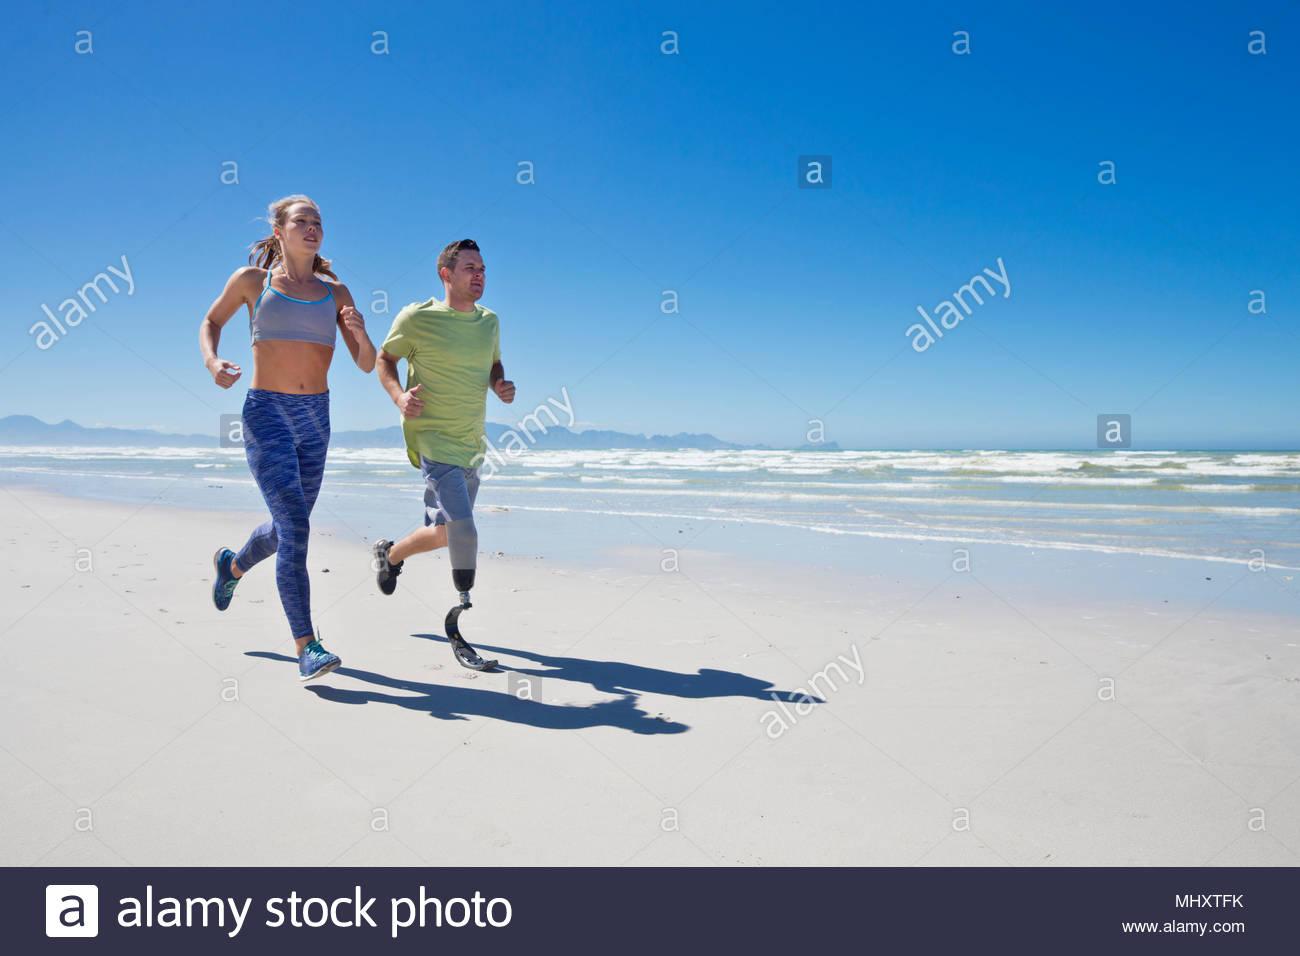 Man Wearing Prosthetic Blade Running Along Shoreline Of Beach With Female Partner - Stock Image